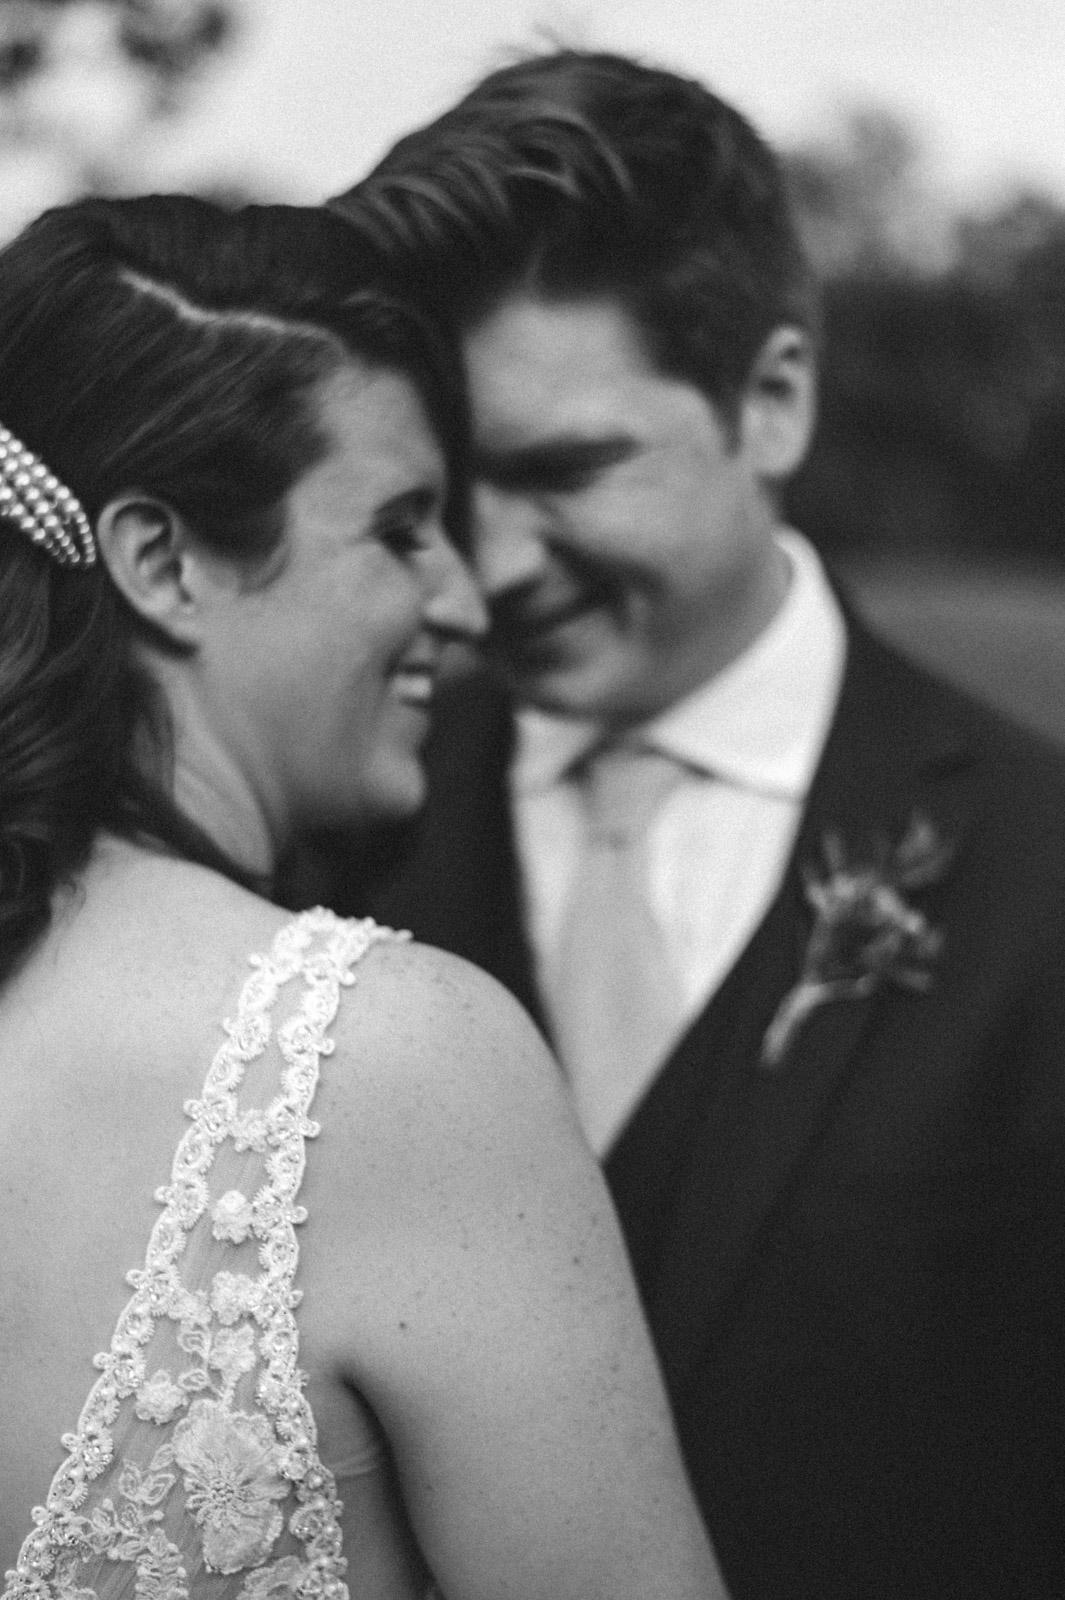 Emerson & Elicia's Golf Course Wedding Aidan & Leanne Hennebry Hamilton Wedding Videographers Photographers Niagara Hush Hush Photography & Film-54.jpg